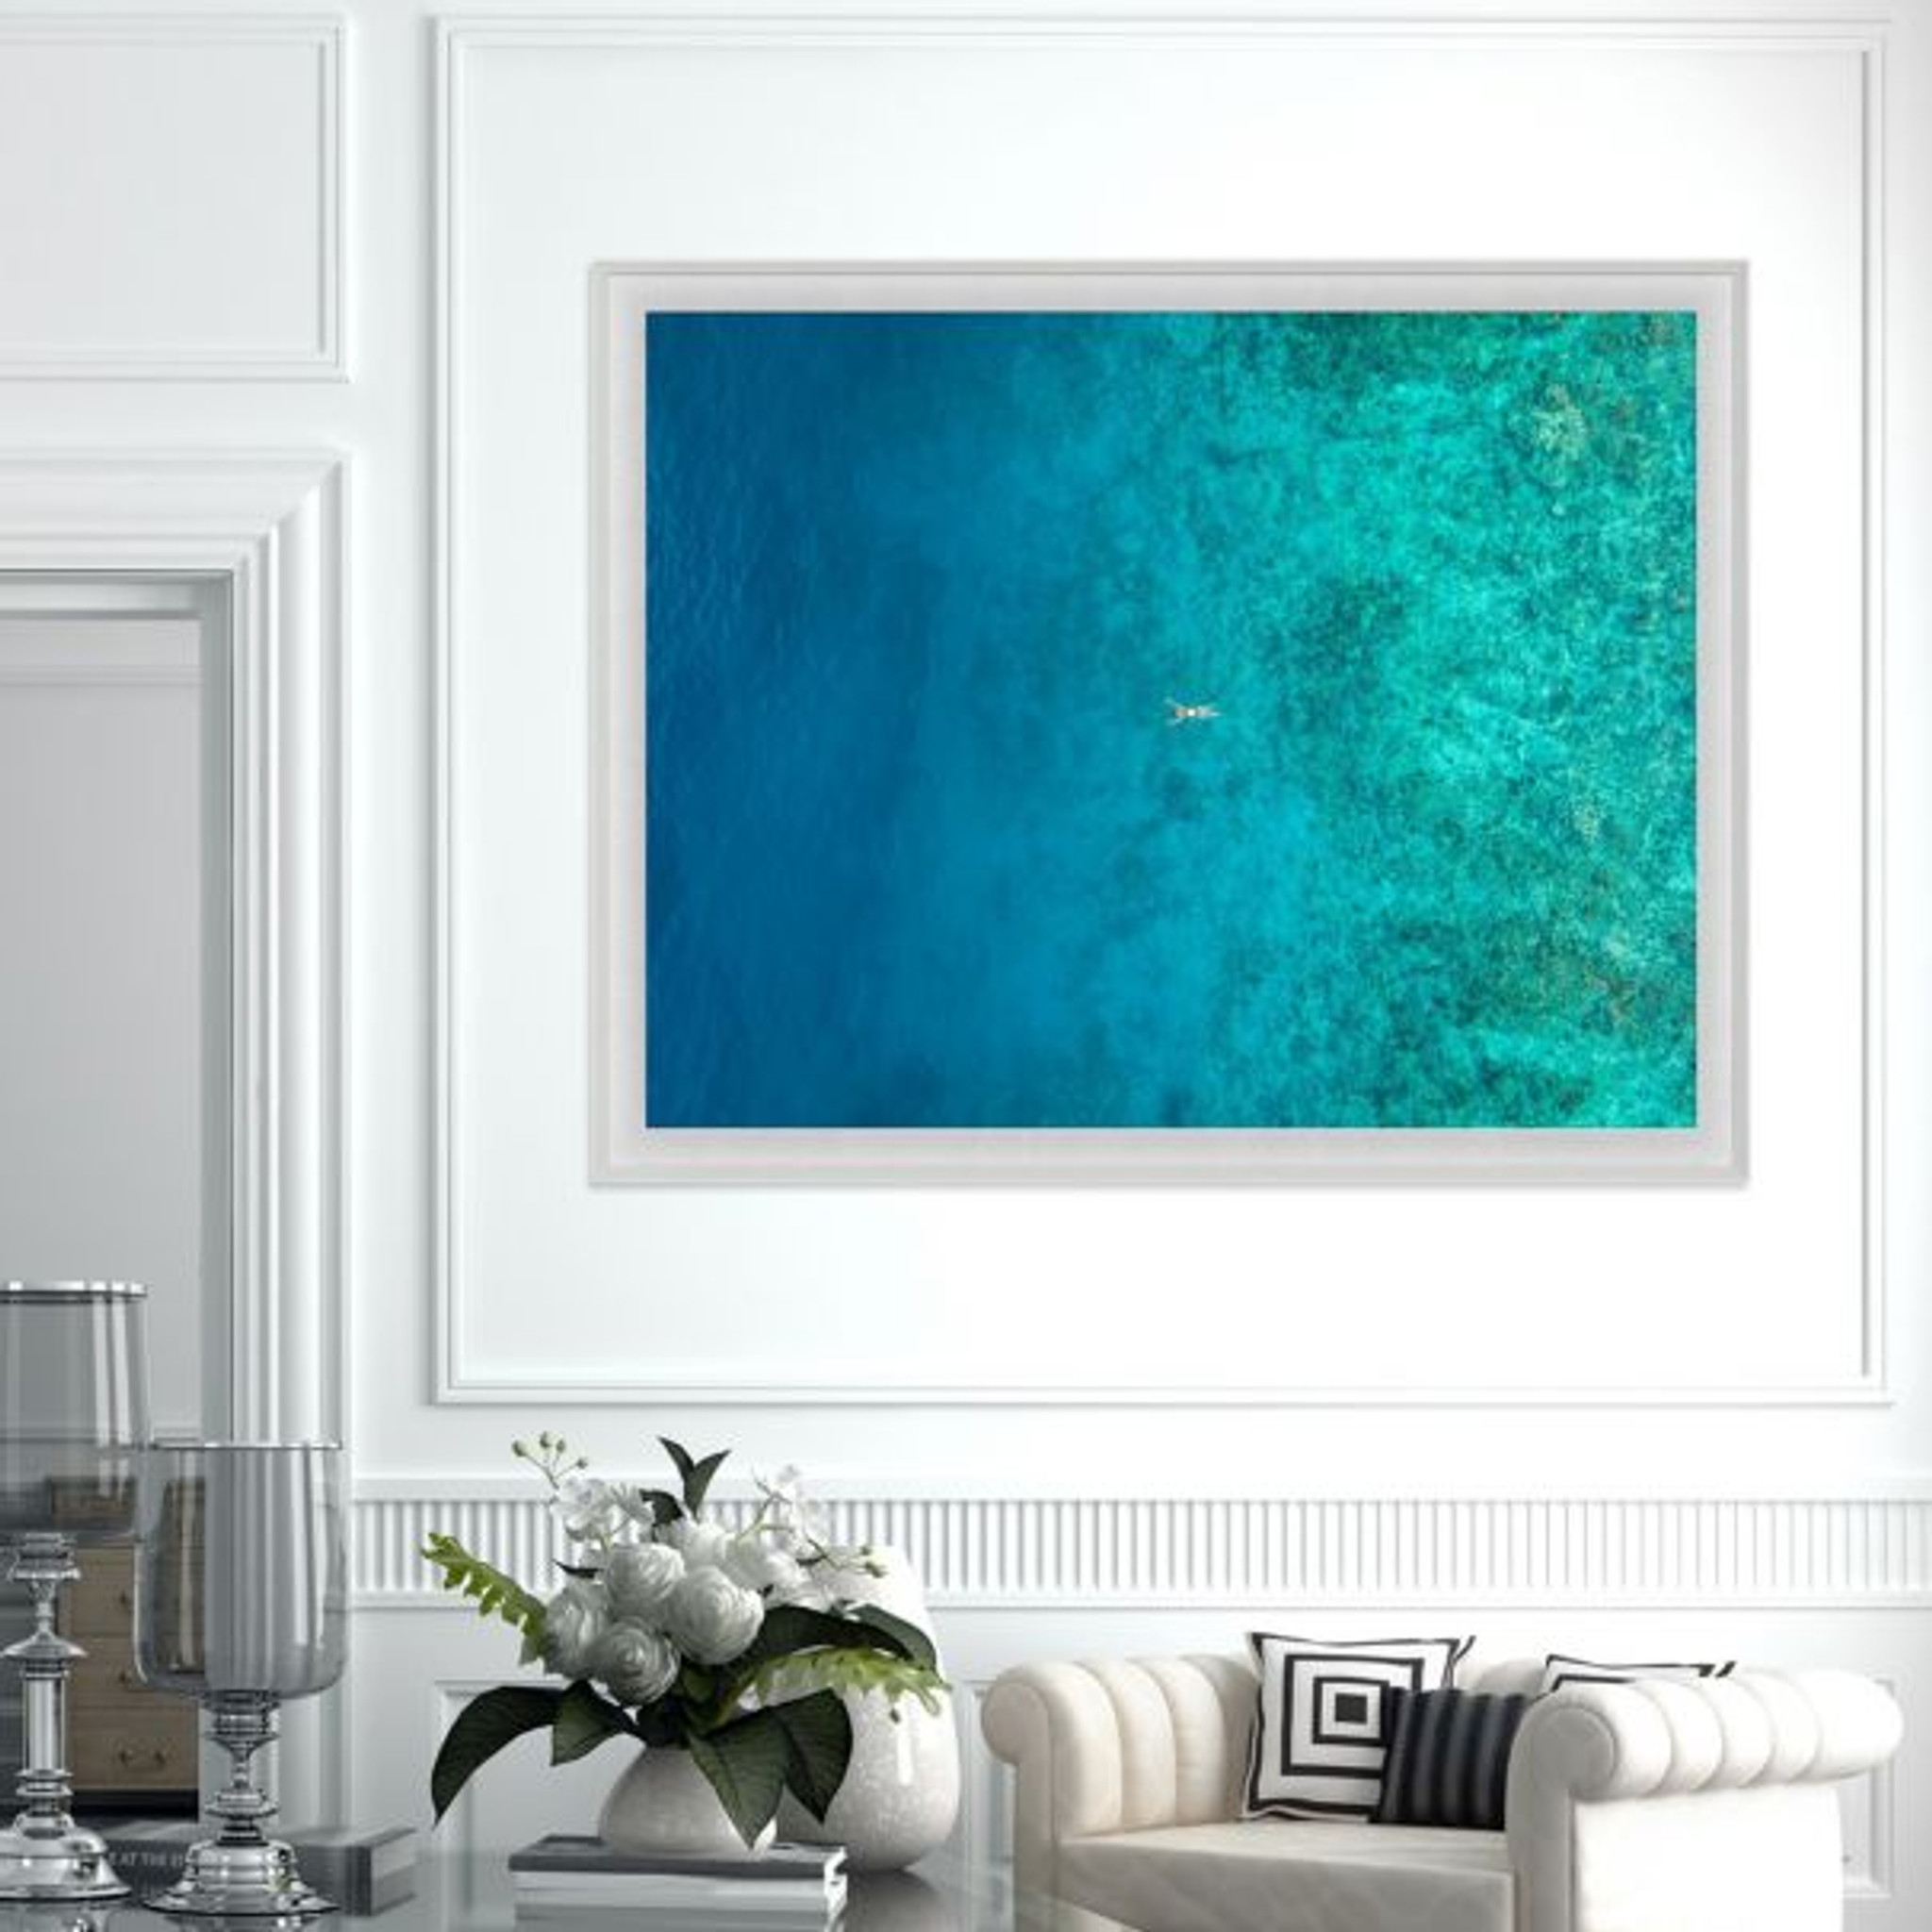 Natural Curiosities Folden Float ocean no 9 Fine Photography Wall Art with Acrylic Frame